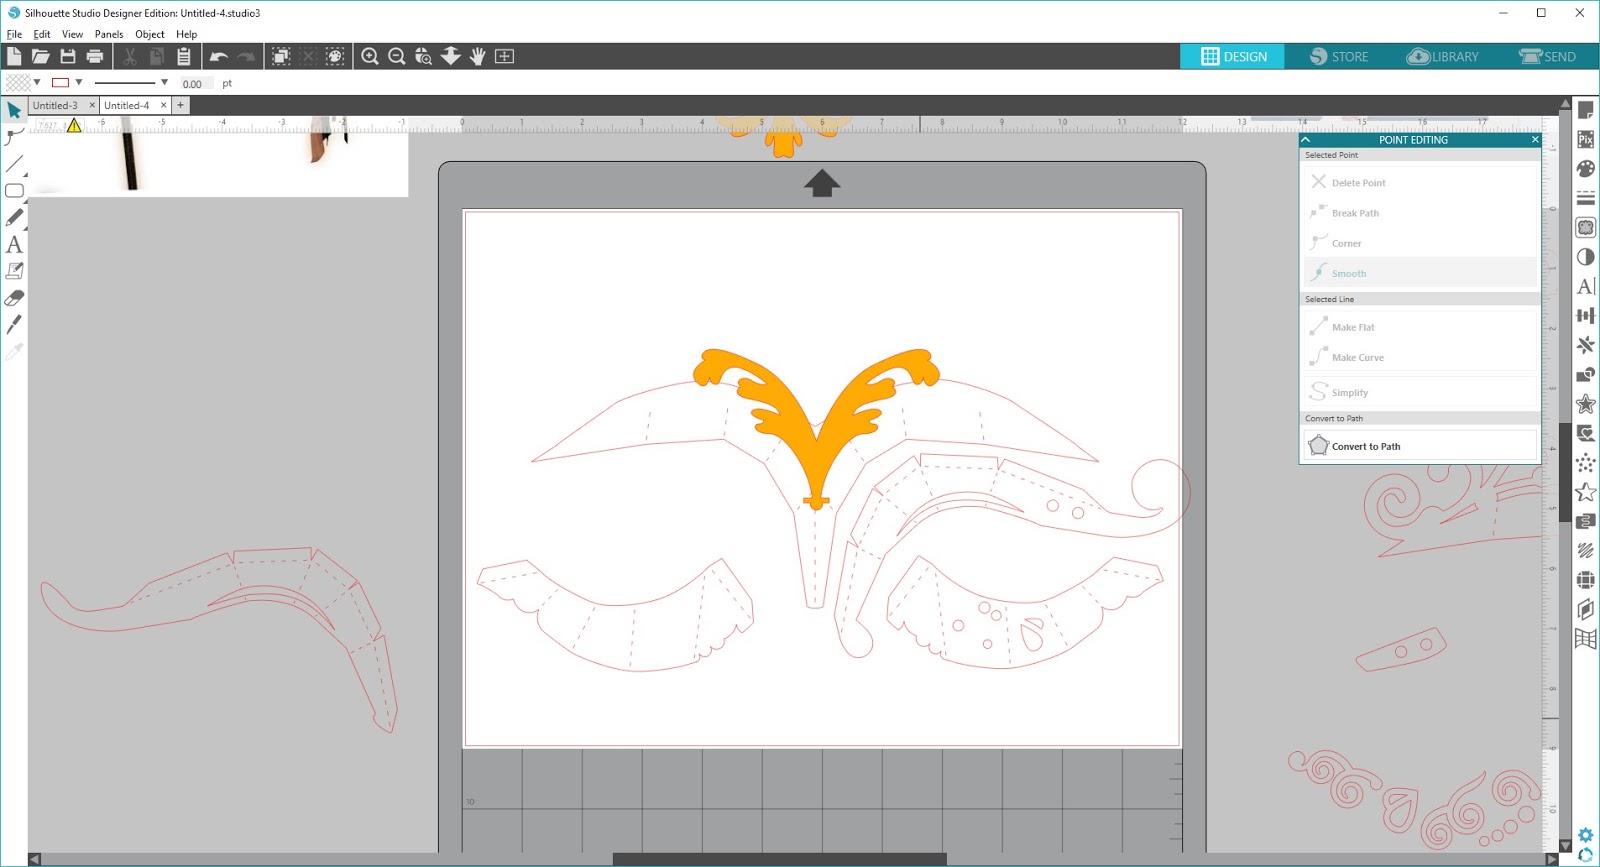 Silhouette Studio Designer Edition Software Download